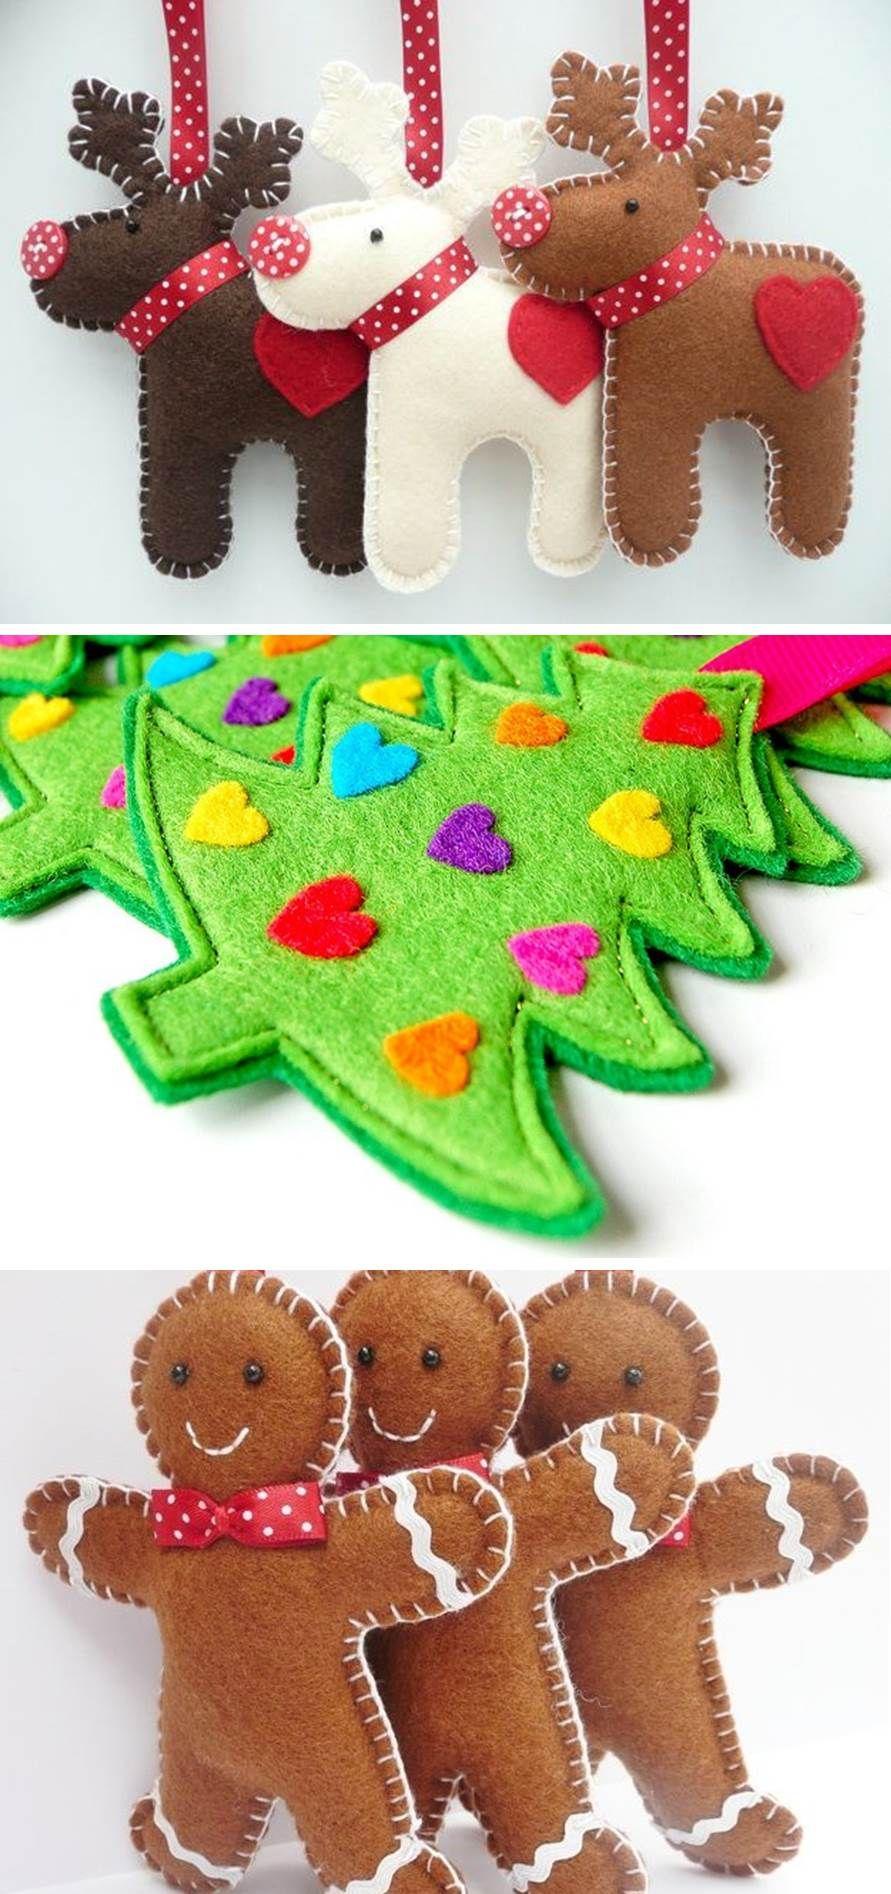 Diy Pinterest Project 3 Enfeites De Natal Em Feltro Day